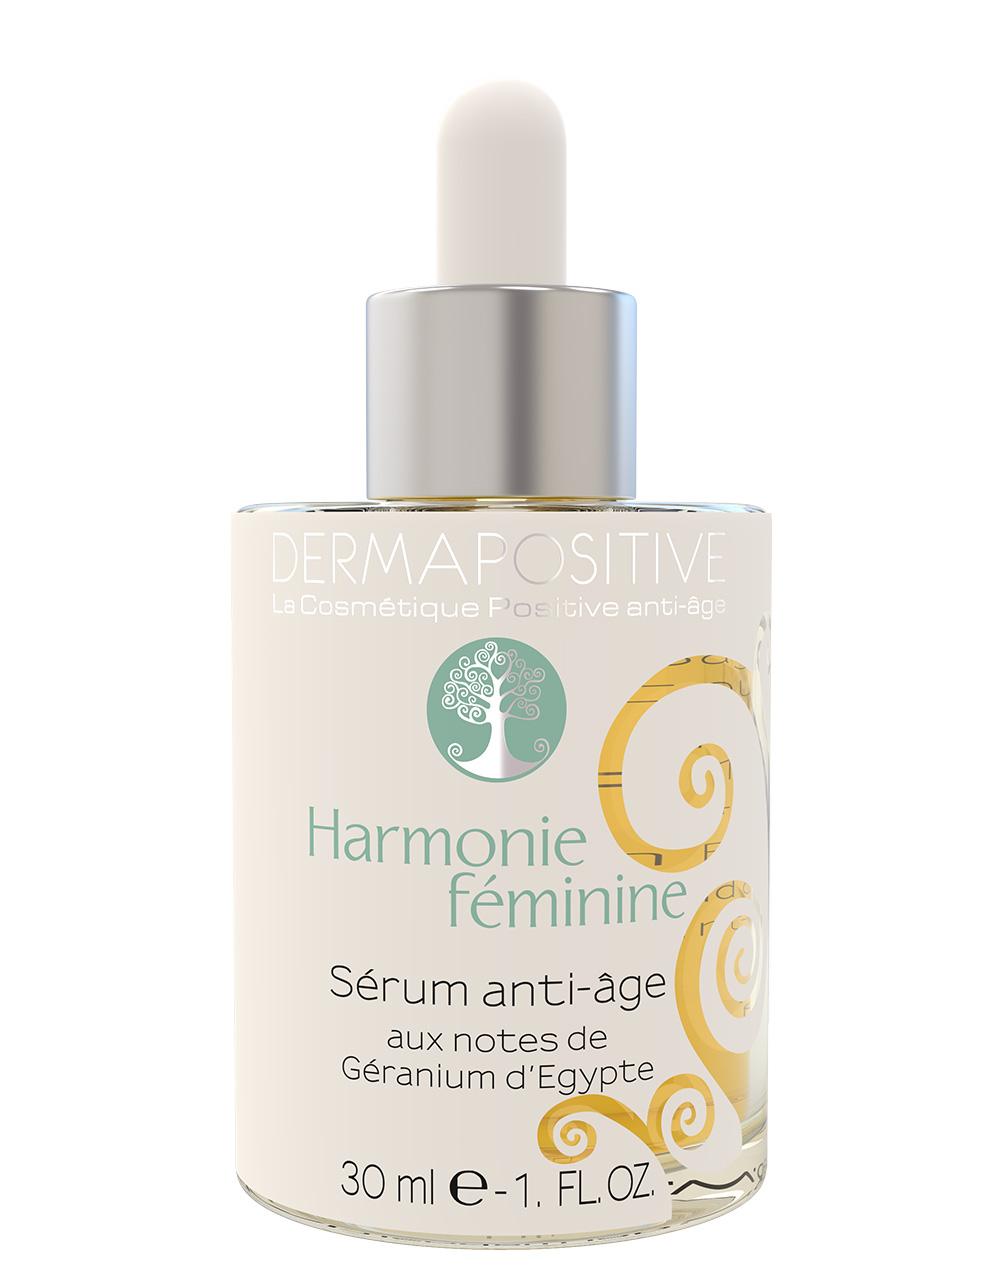 Dermapositive_harmonie_Feminine_serum_antiage